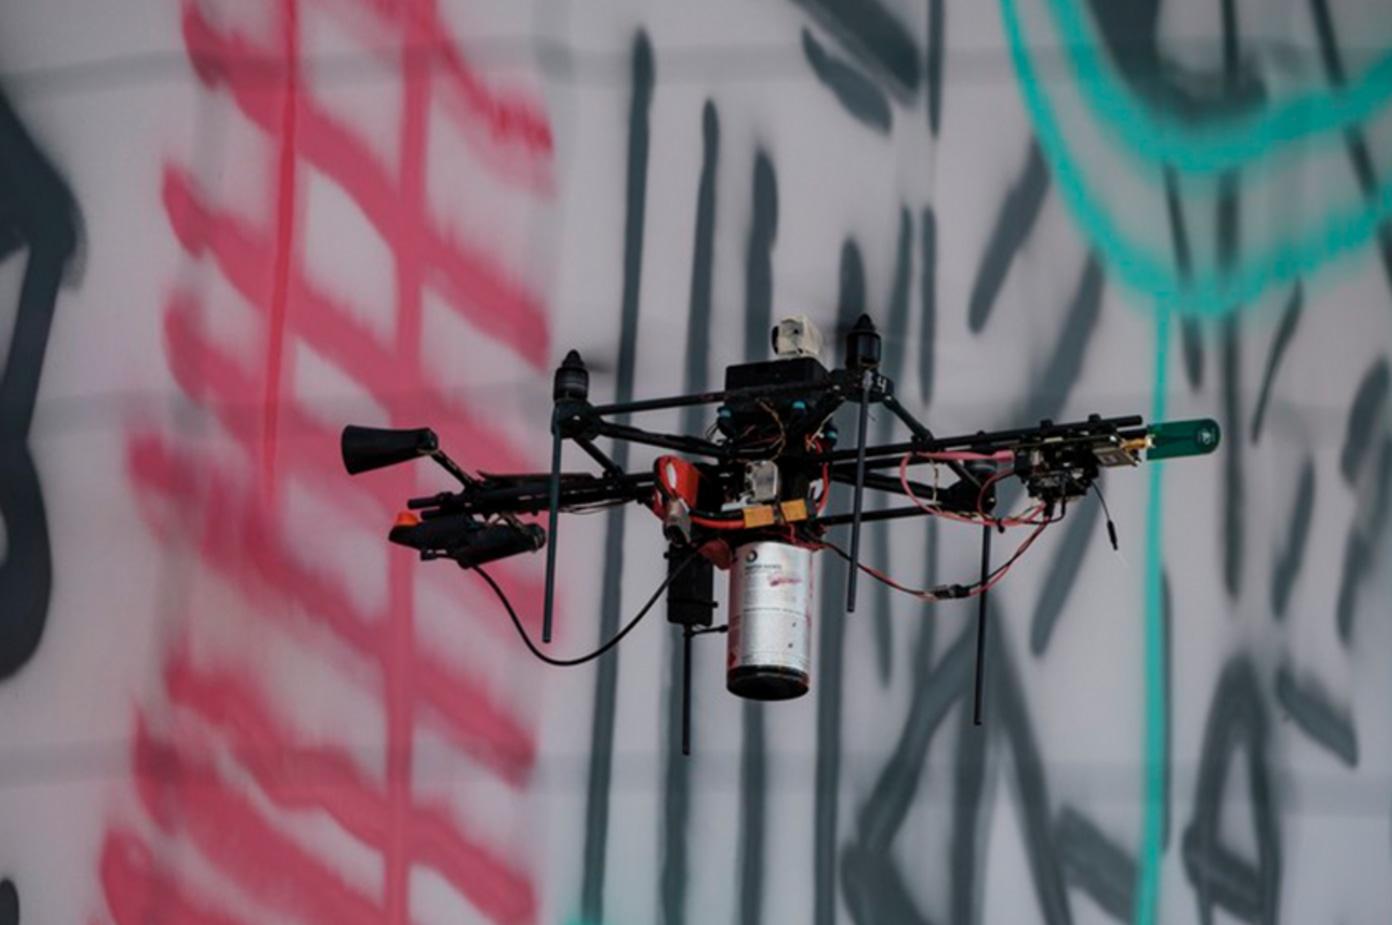 Watch A Swarm of Drones Do Graffiti